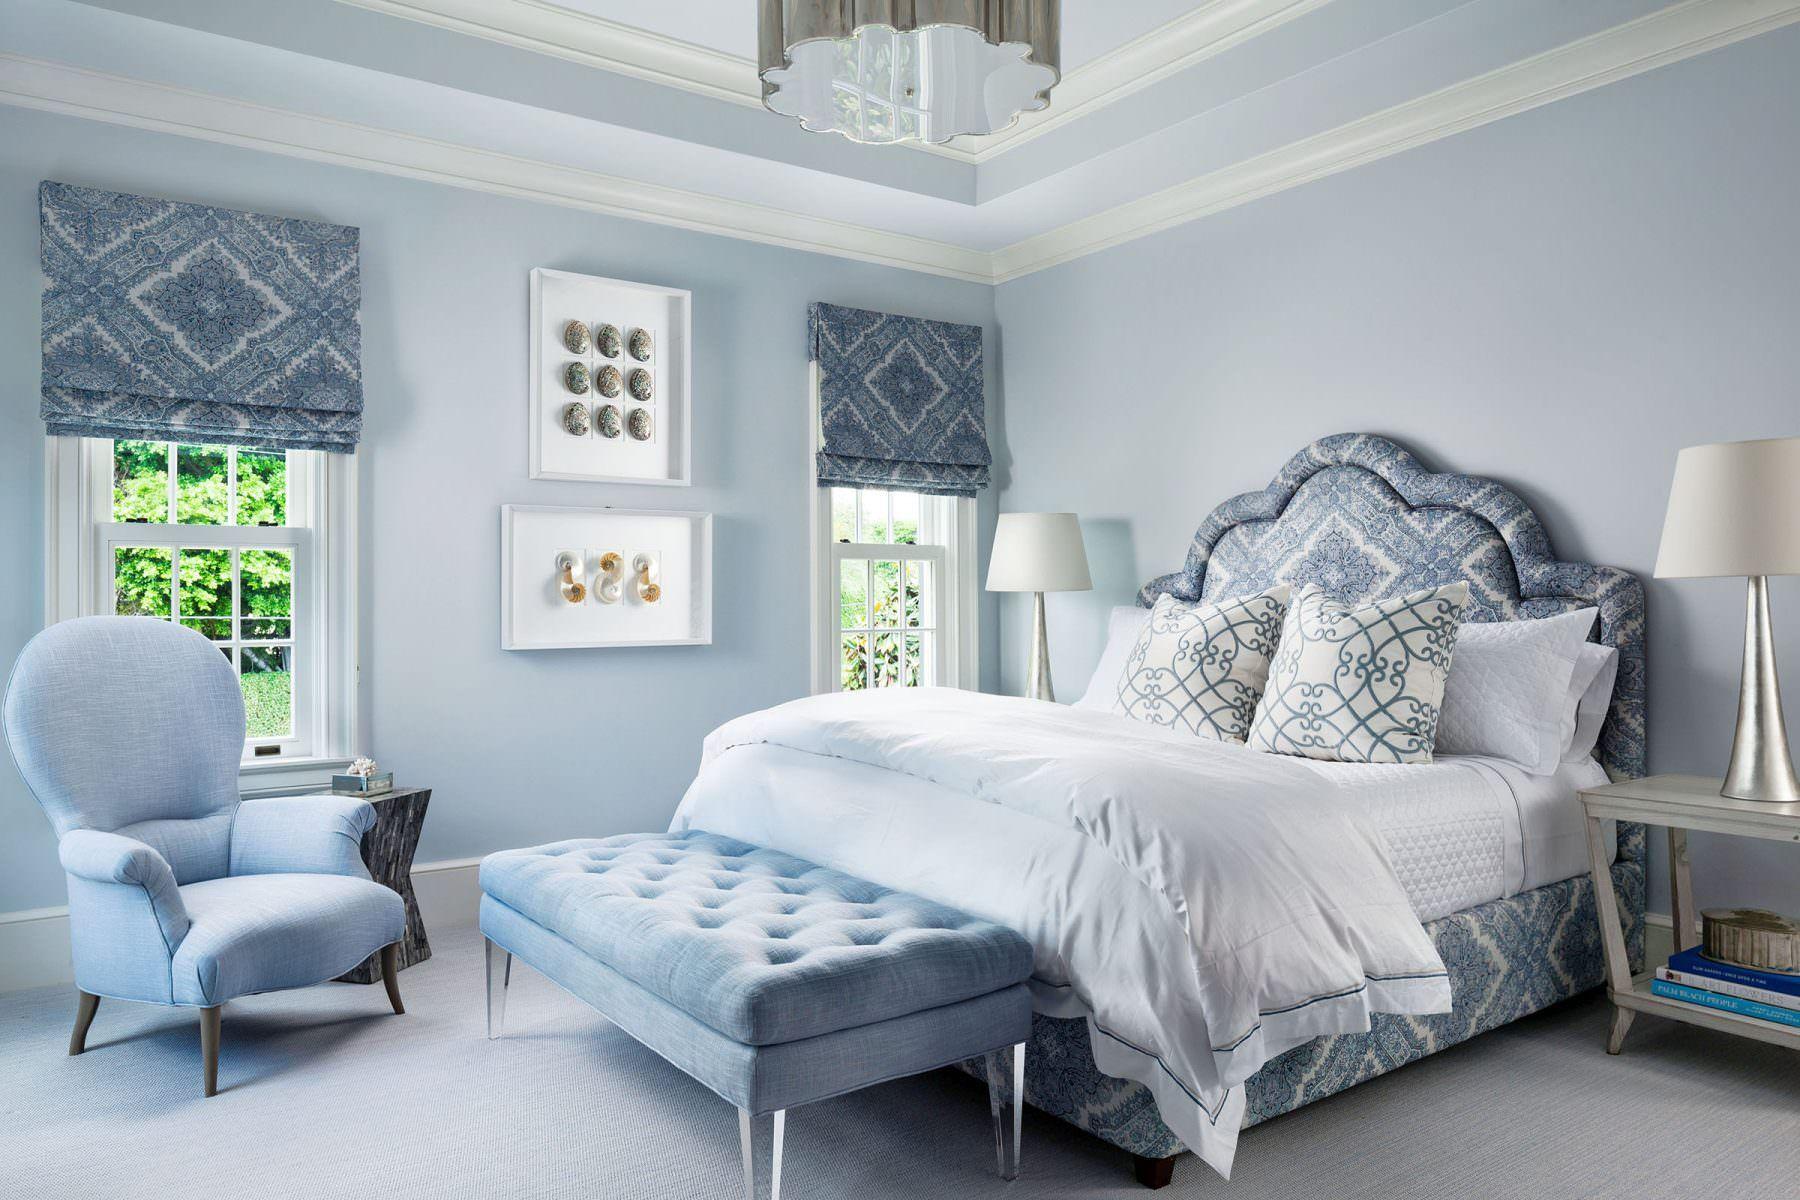 Elegant Island Residence Mccann Design Group Blue Master Bedroom Blue Bedroom Silver Bedroom